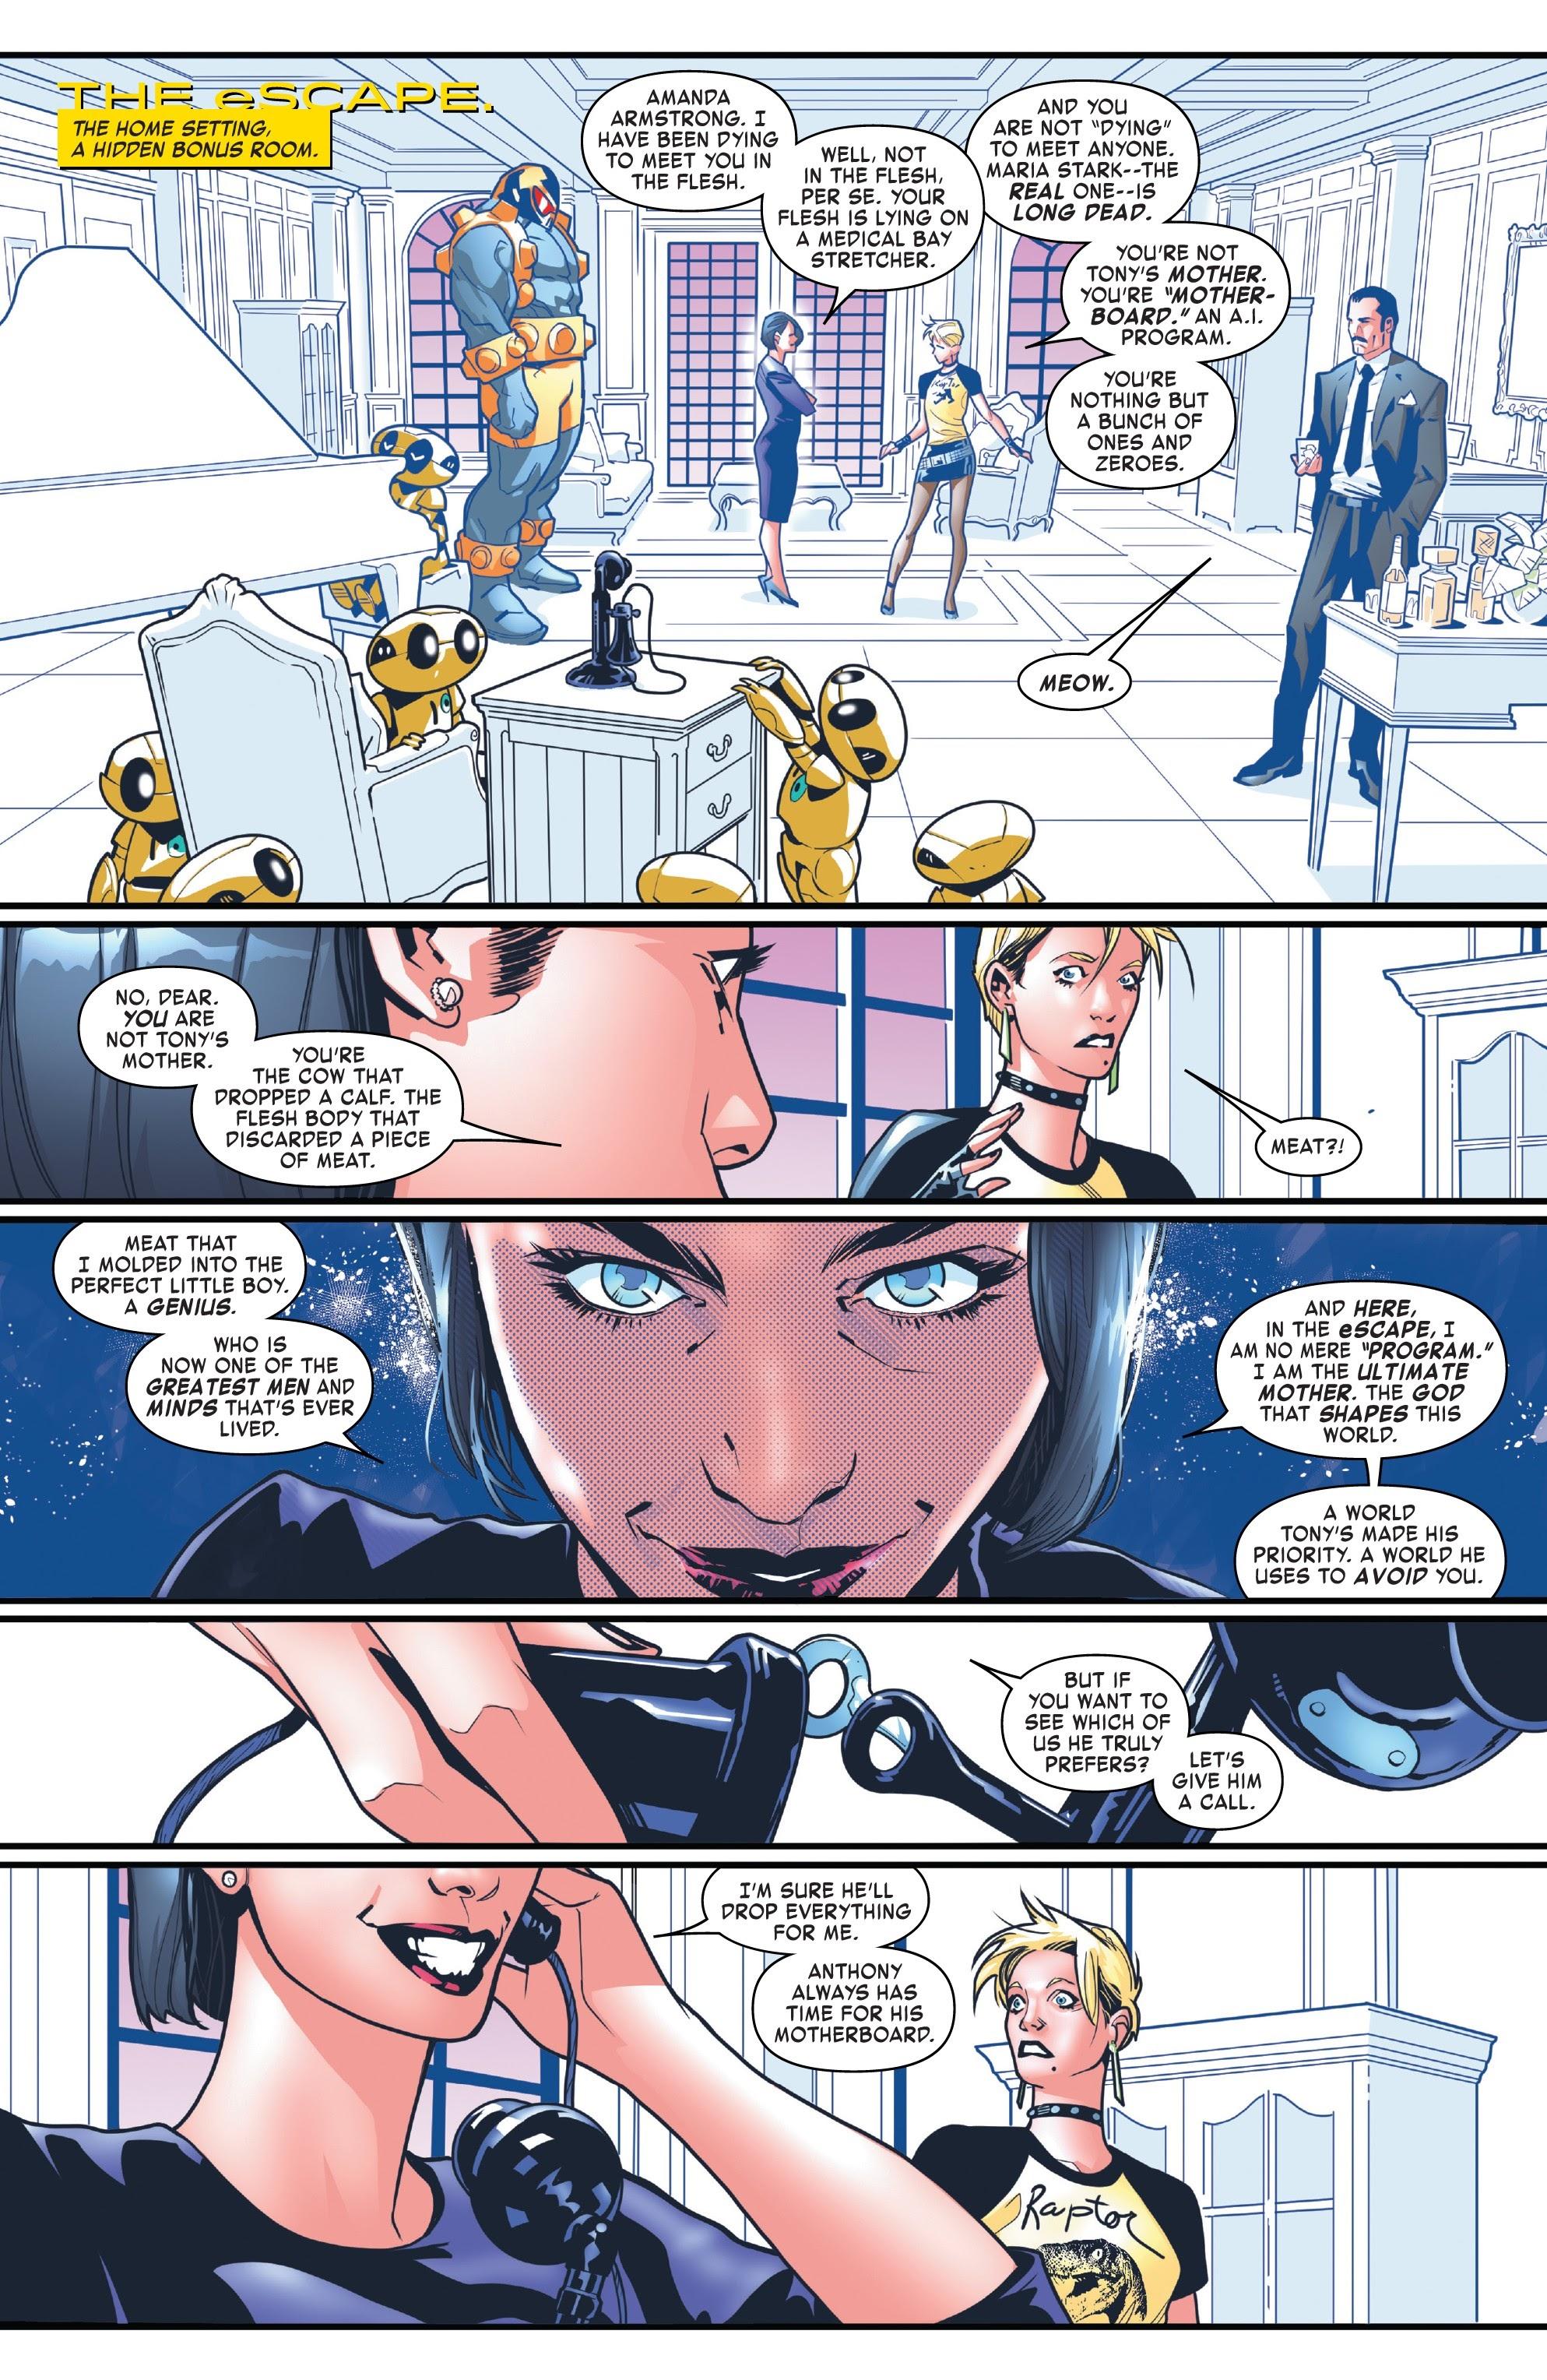 Read online Tony Stark: Iron Man comic -  Issue #8 - 13